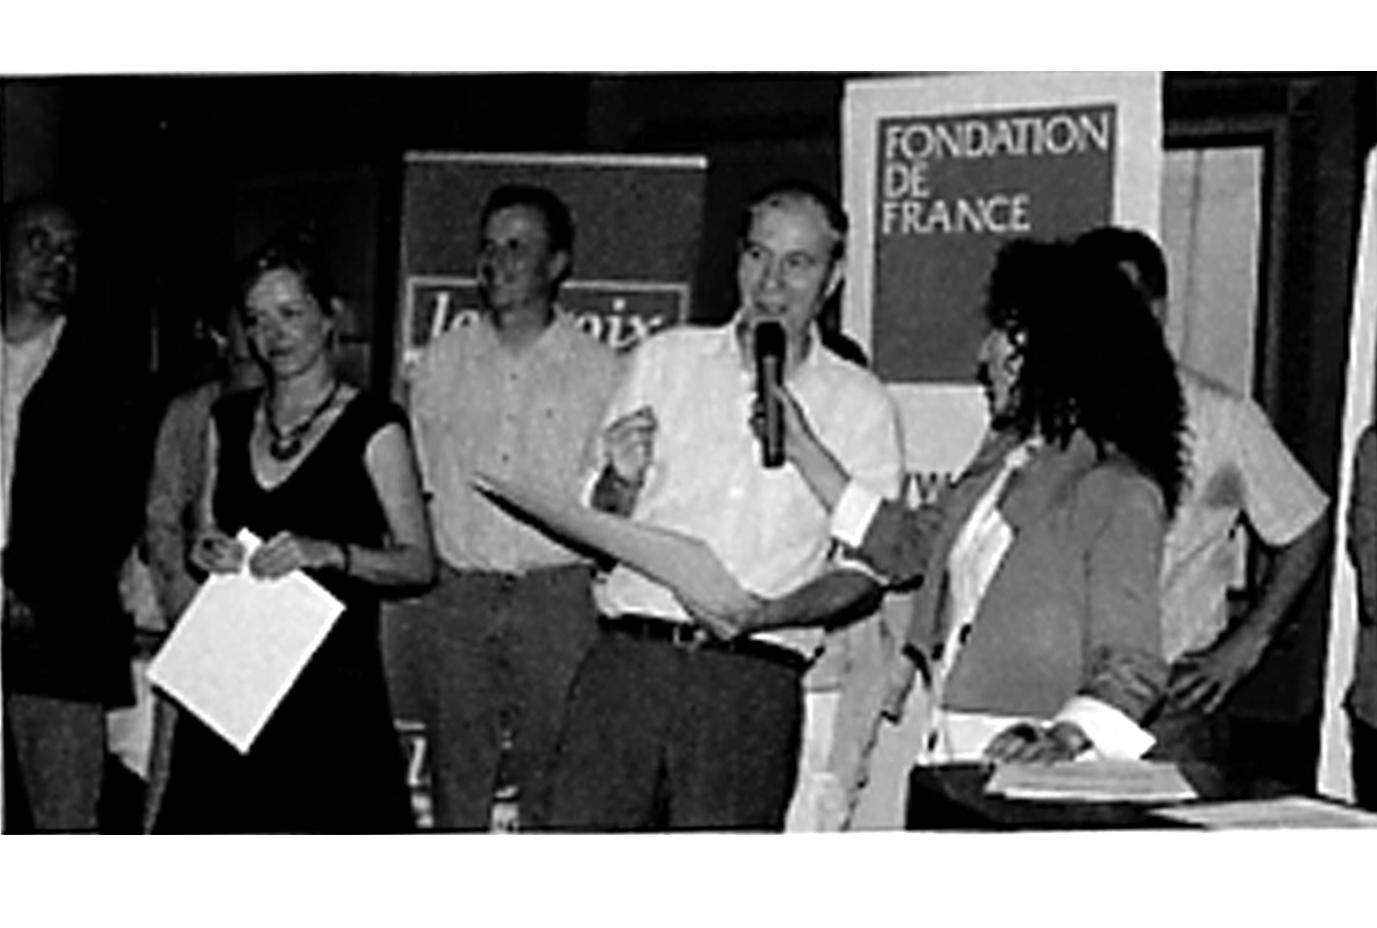 14 Trophées FDF # Lille magazine N°44 Sept2007